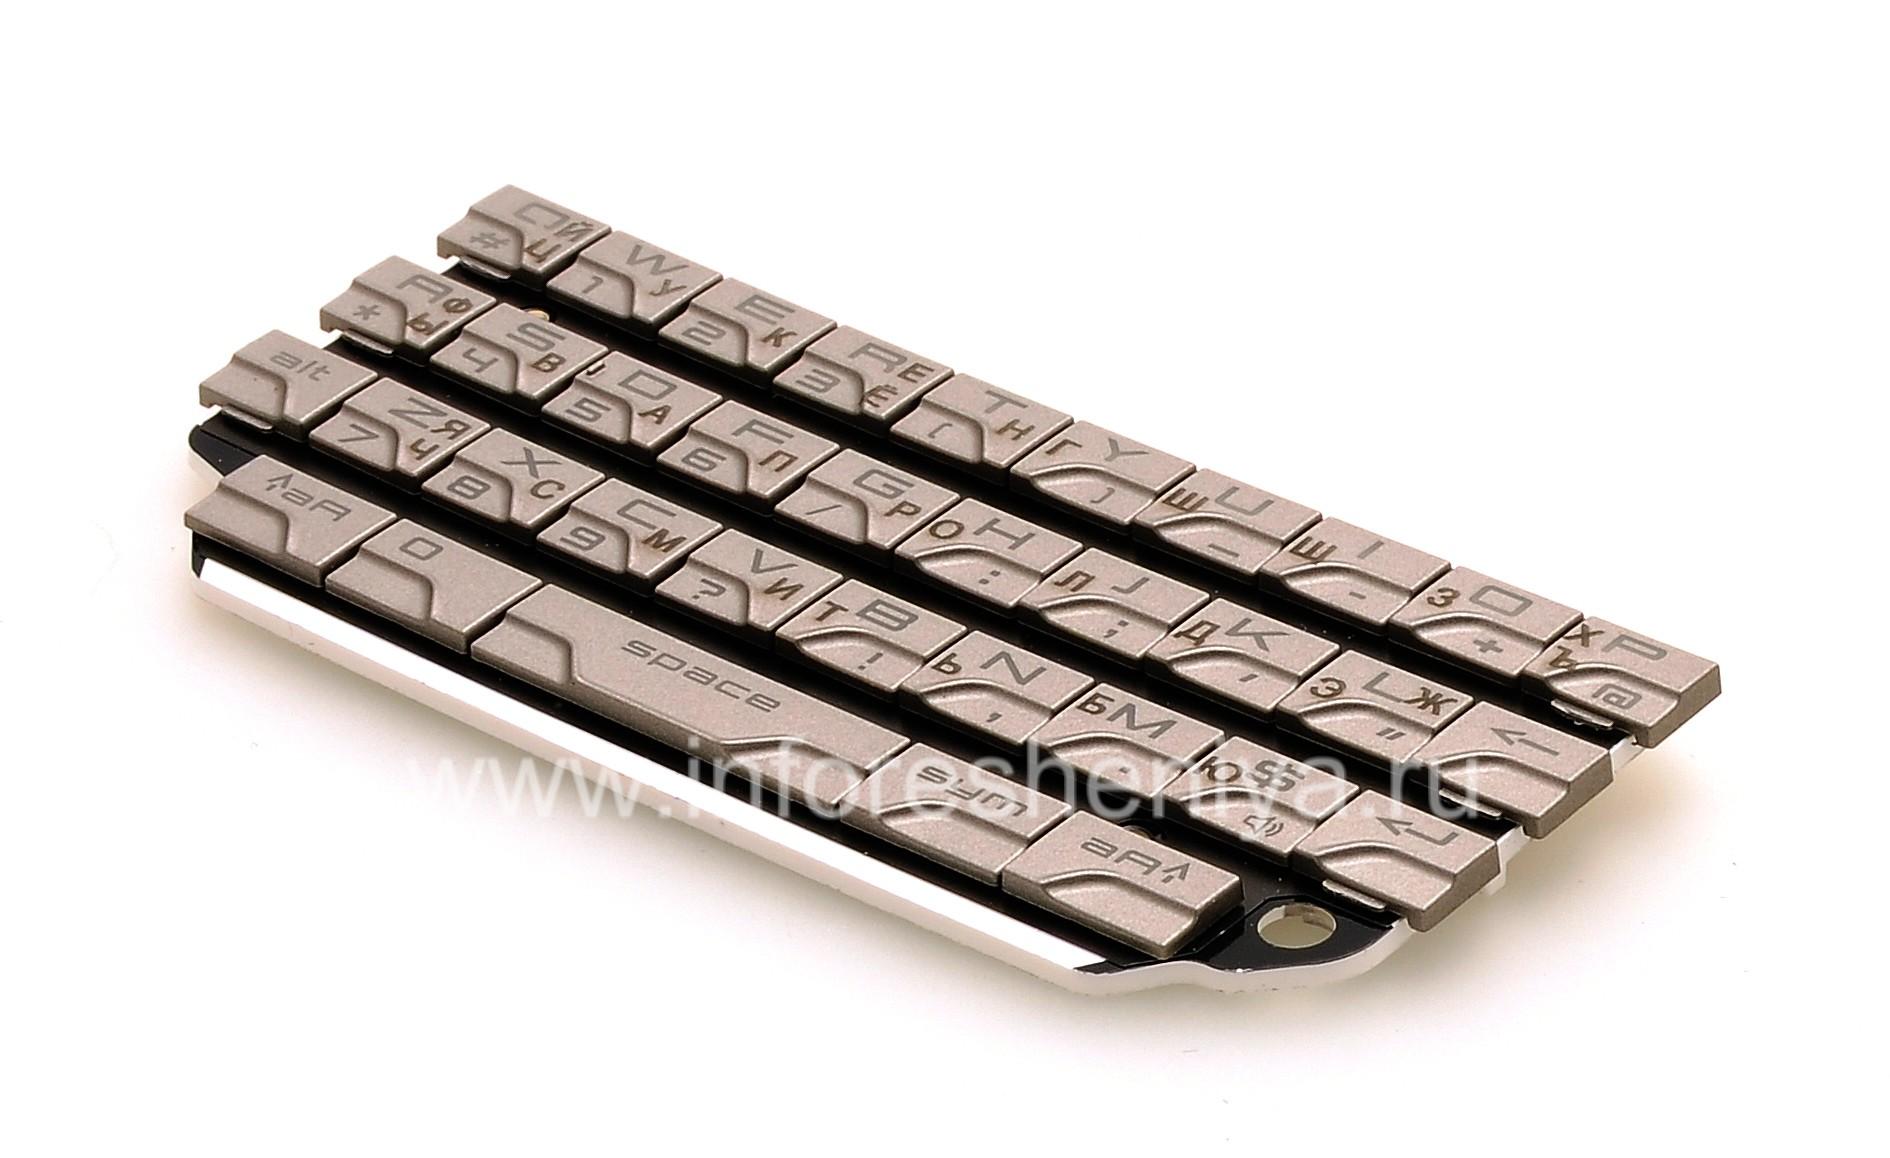 Клавиши клавиатуры Фото и описание кнопок на клавиатуре